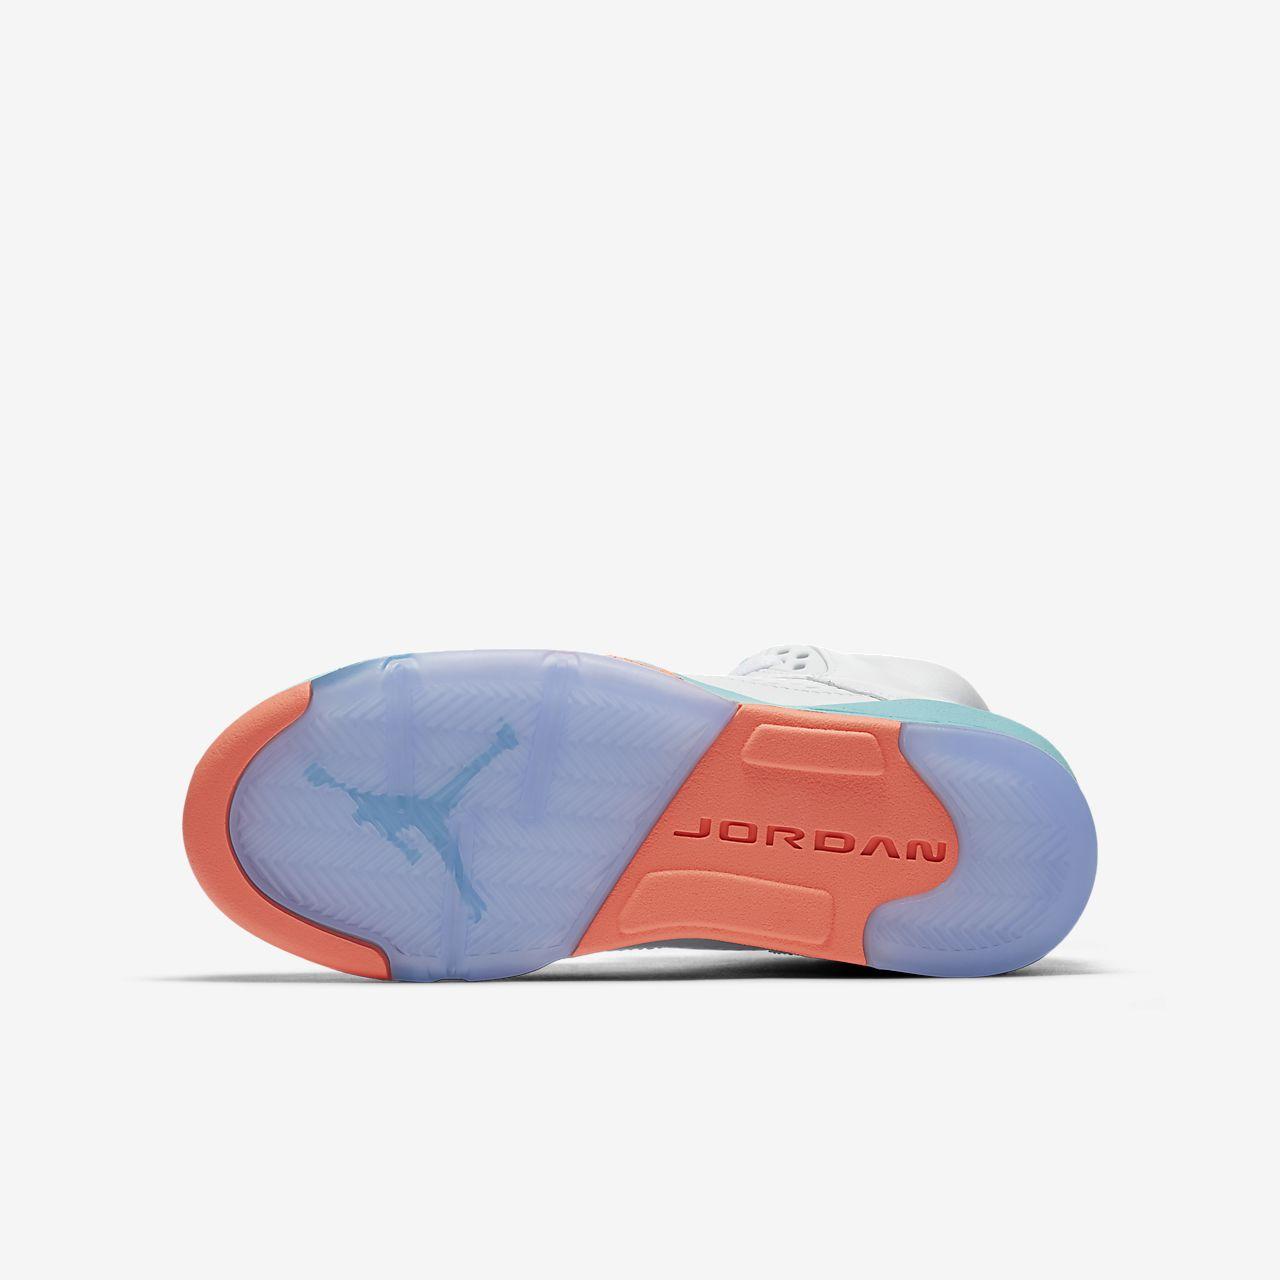 a17d74fe4a7161 Air Jordan 5 Retro Older Kids Shoe  Top Quality Nike Air Jordans- Women )NbgzOg3  Jordan Hydro 5 Slide Gym RedIon Pink ...